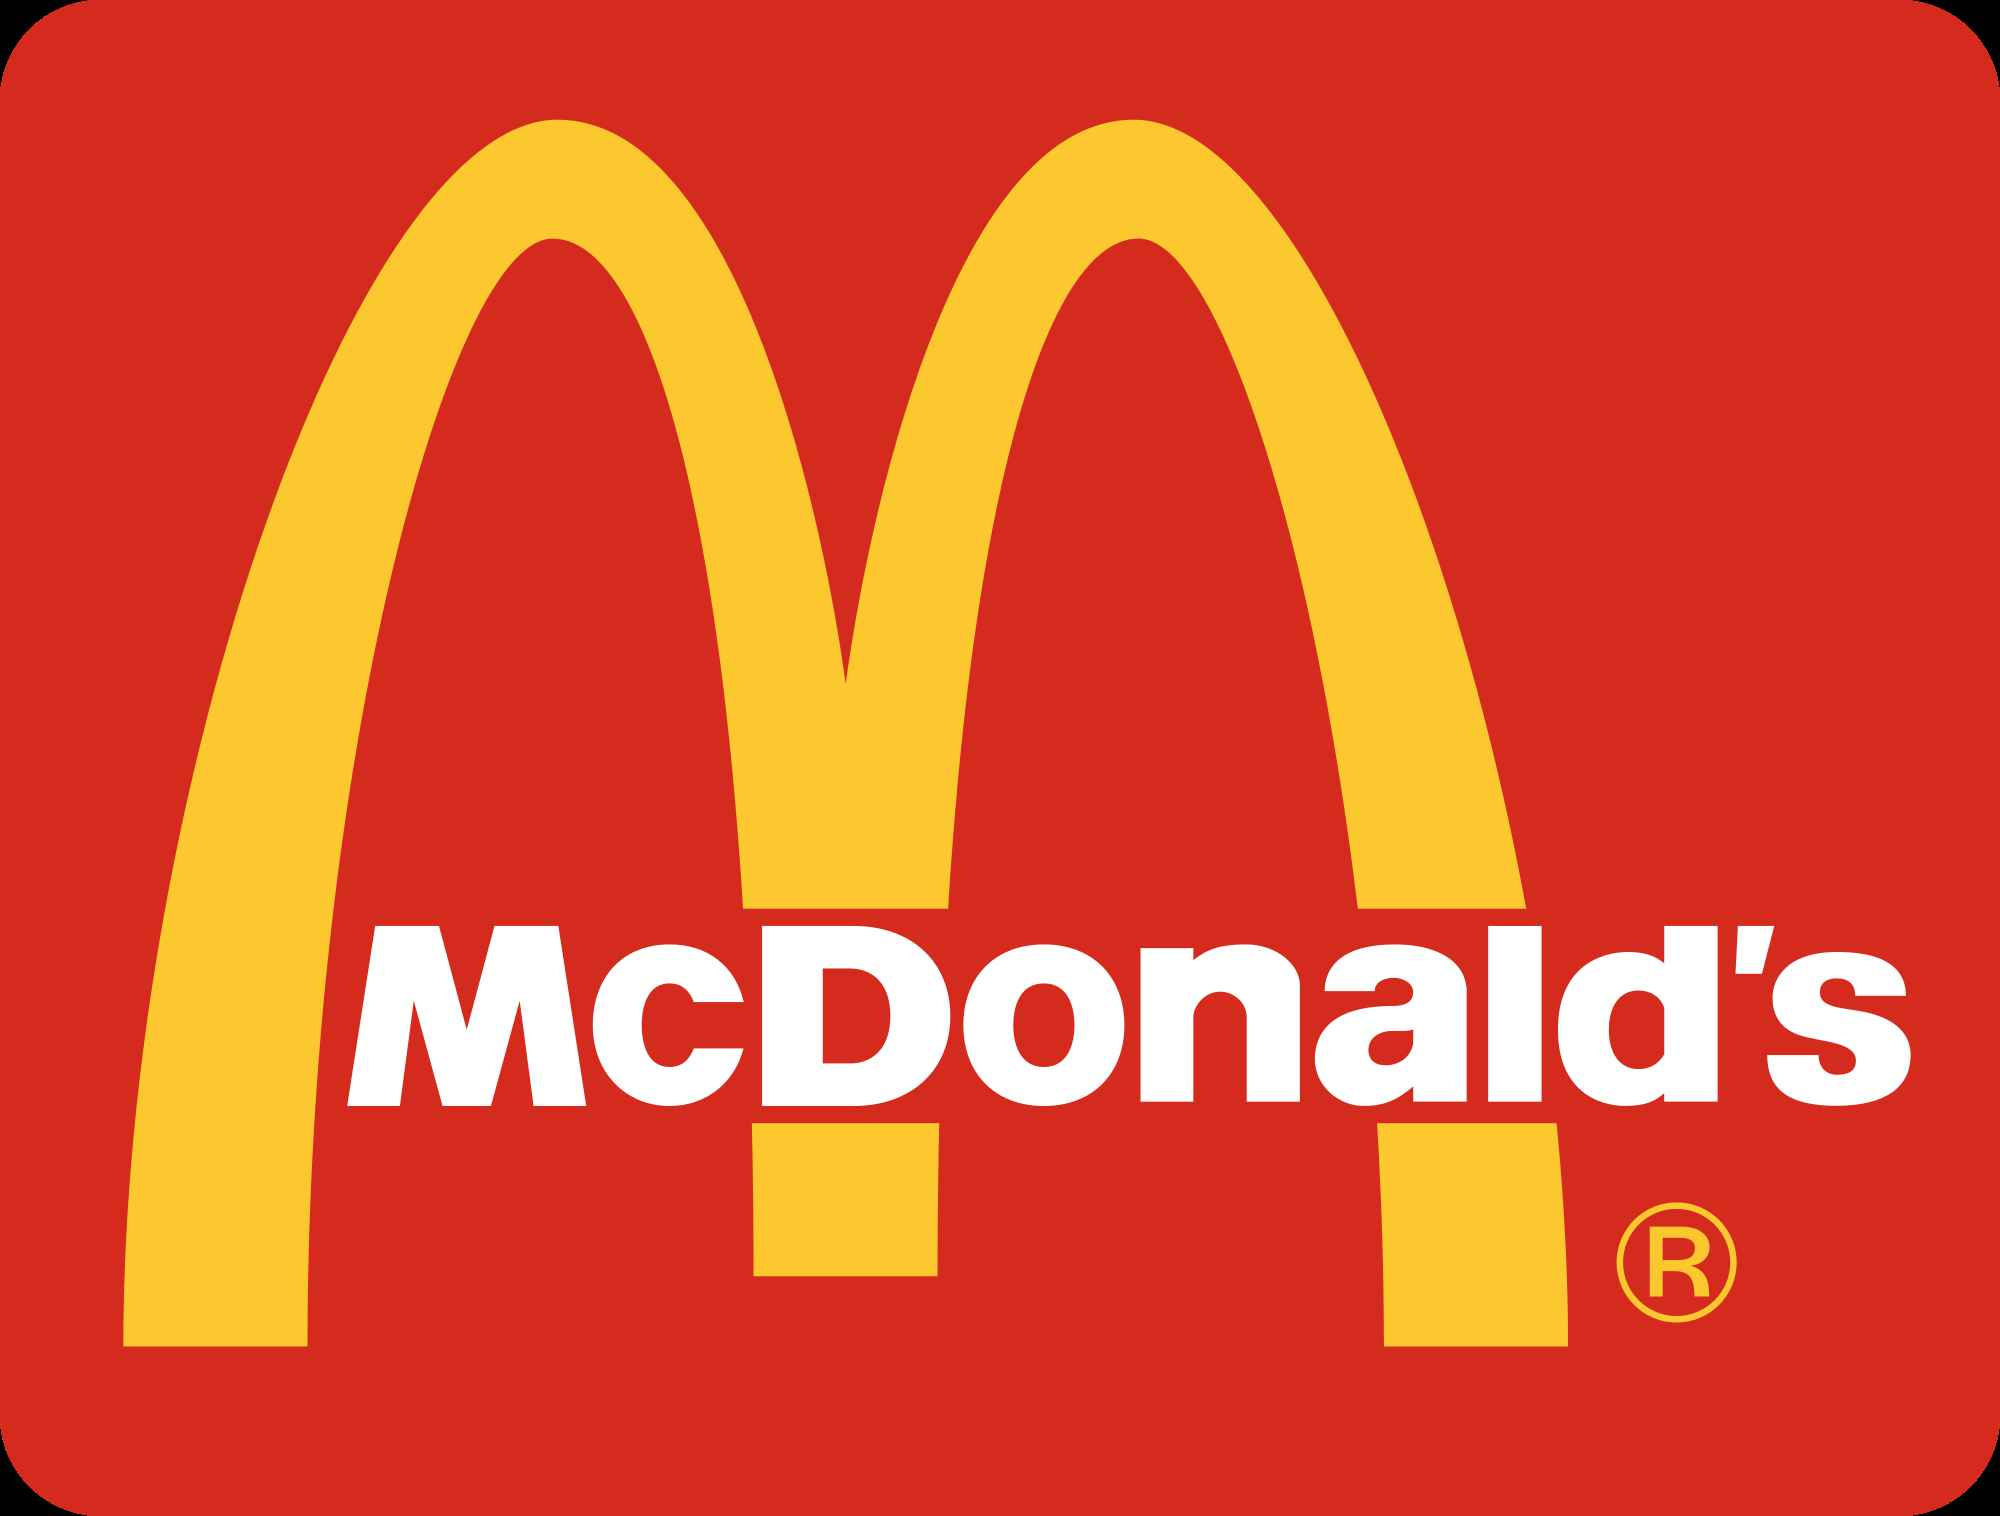 logomarca McDonalds